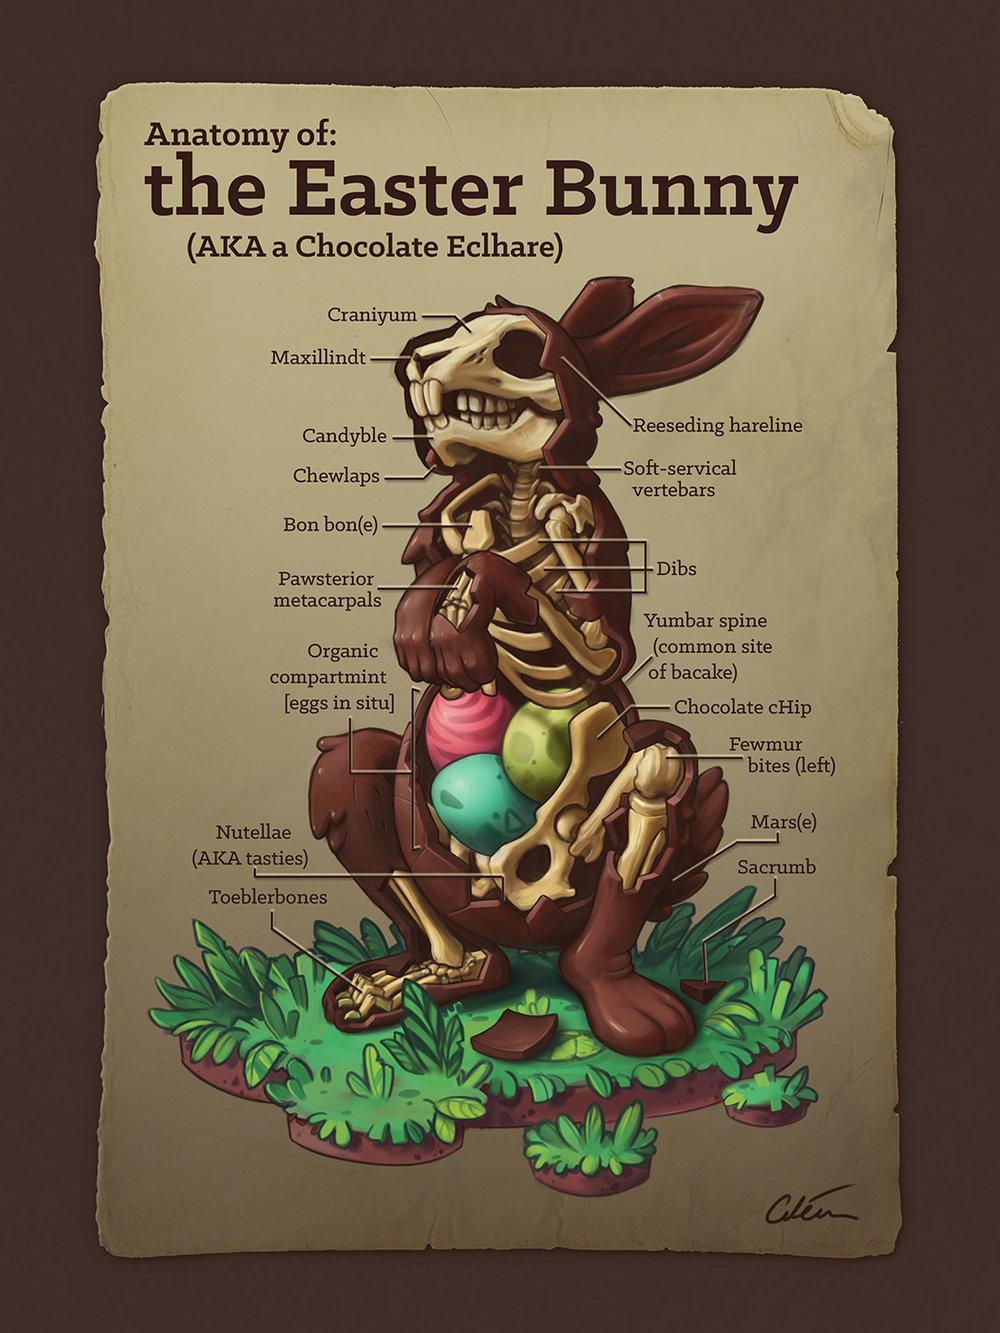 Anatomy of the Easter Bunny, by Dr Ciléin Kearns (artibiotics)